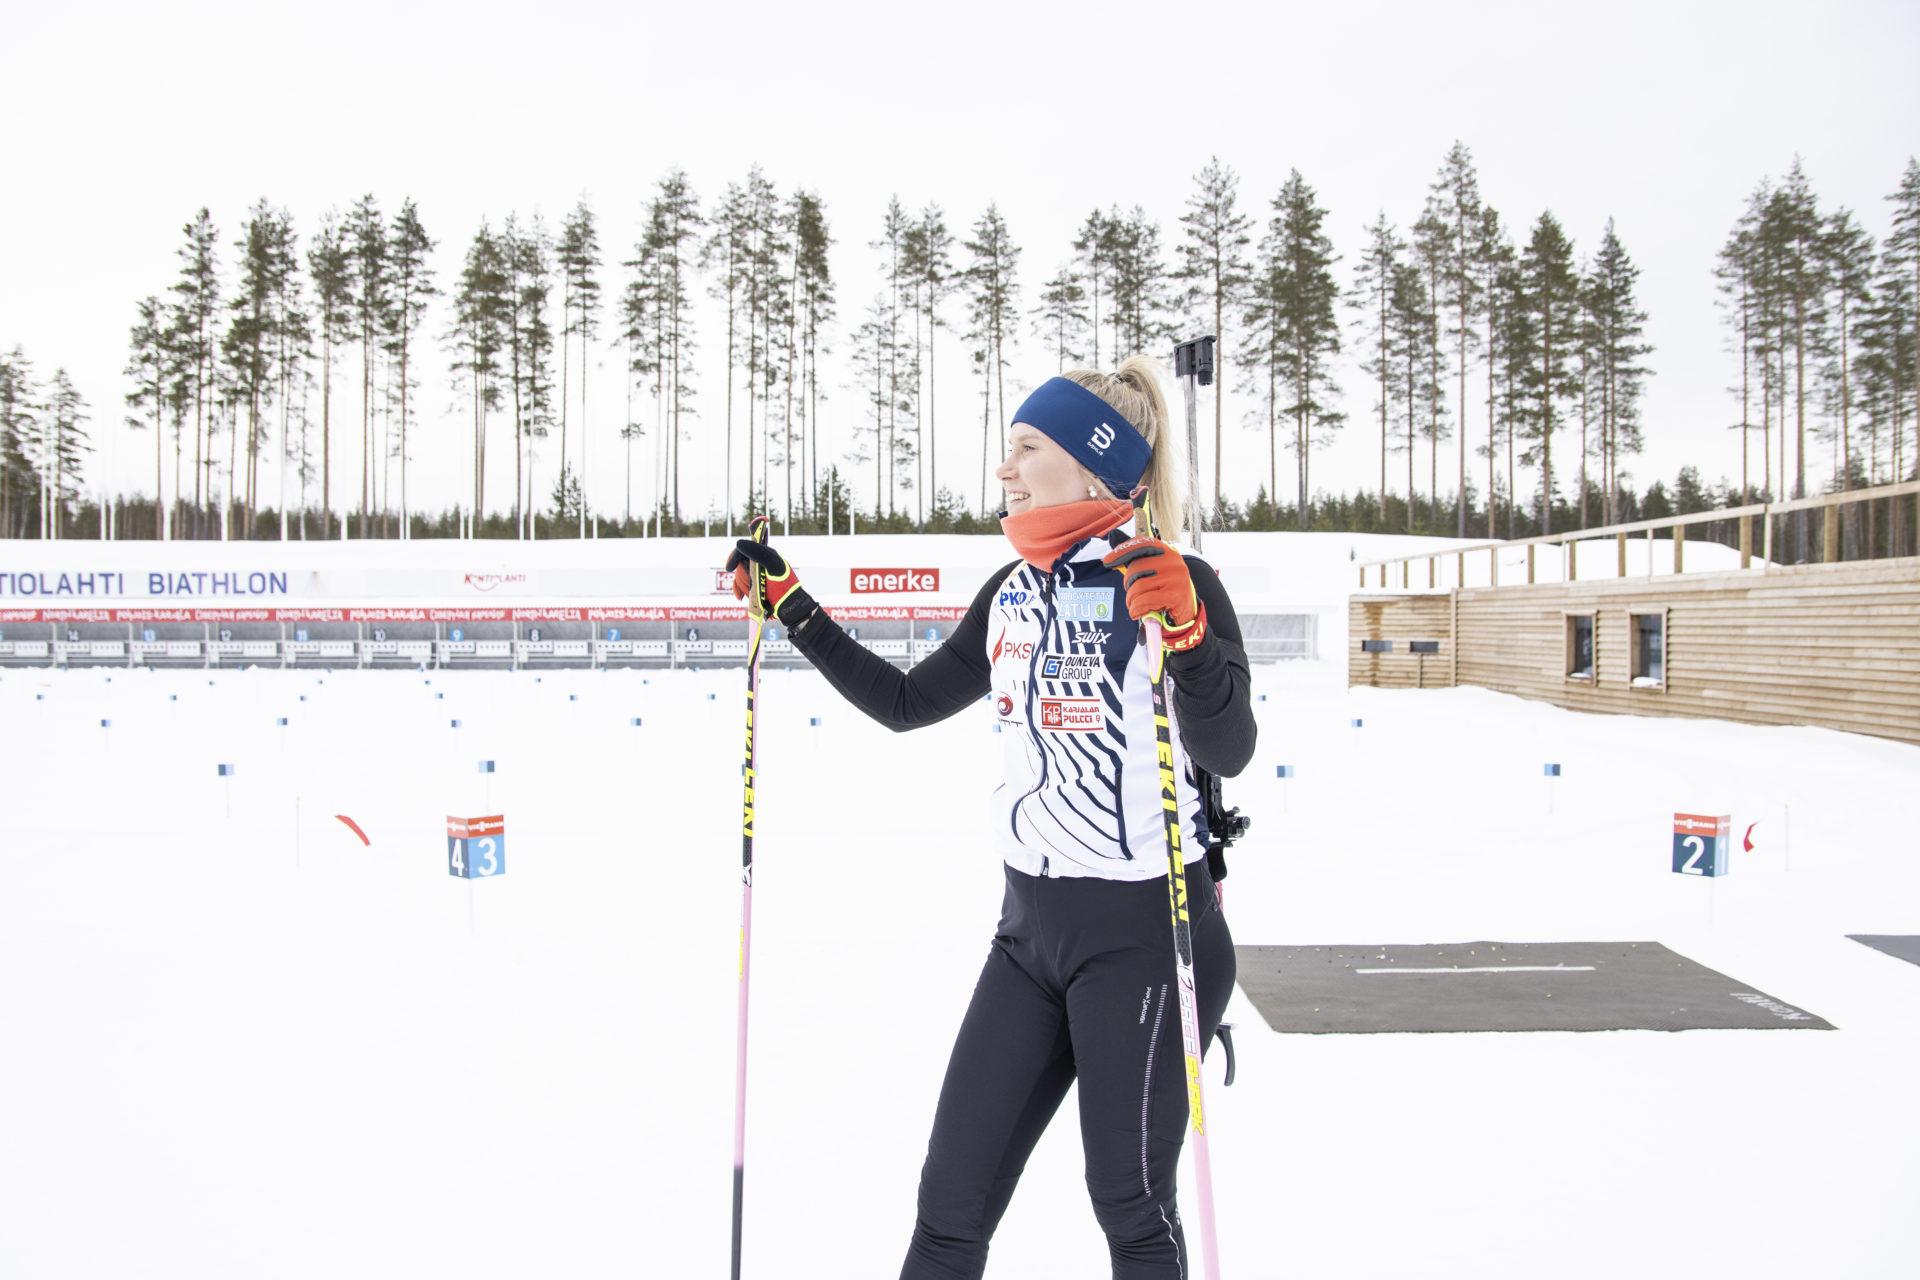 Biathlon athlete smiling at the sun